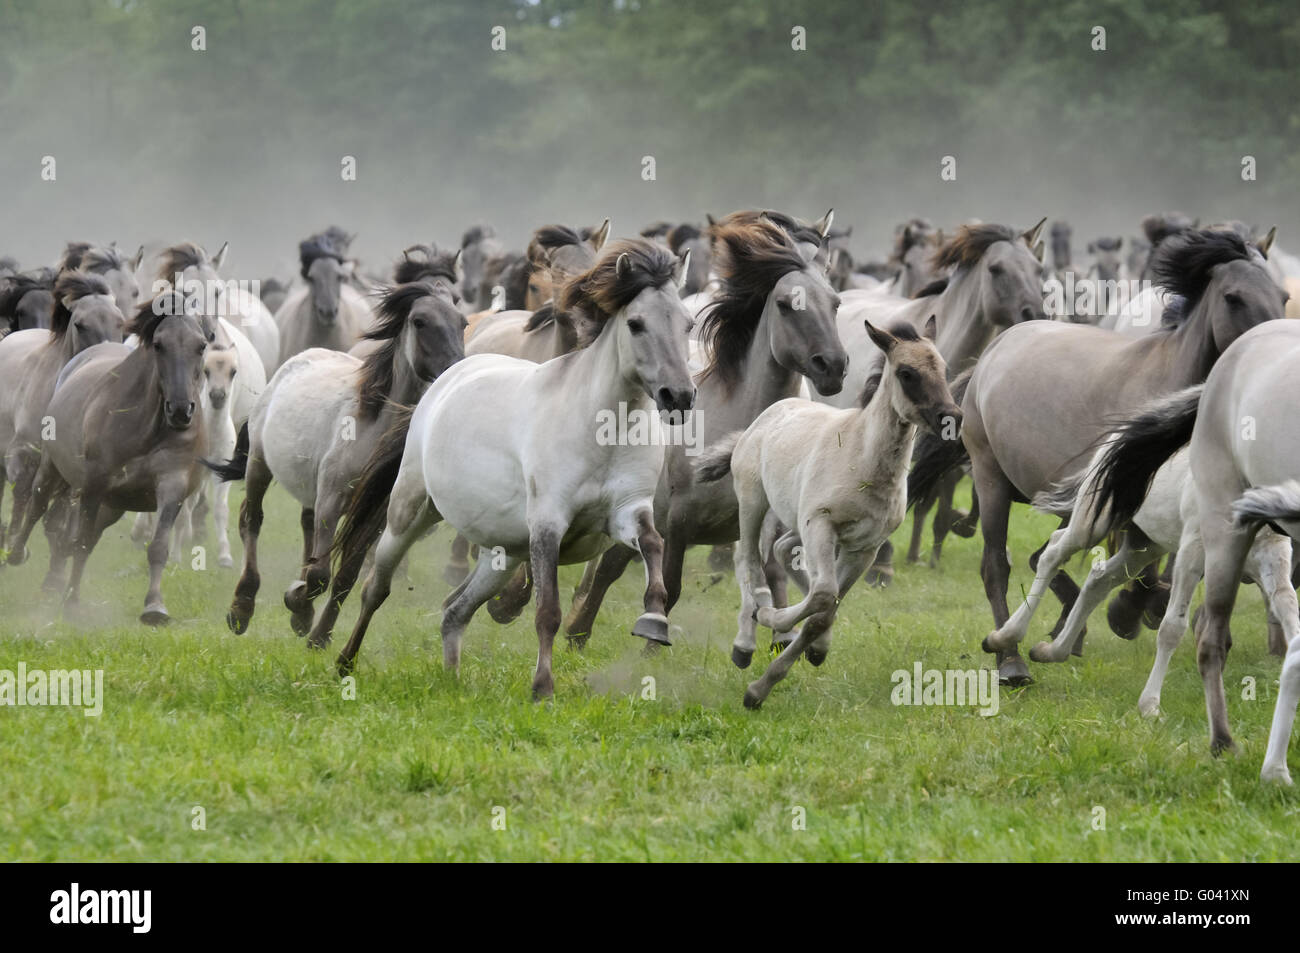 equus ferus przewalskii germany stock photos equus ferus przewalskii germany stock images alamy. Black Bedroom Furniture Sets. Home Design Ideas